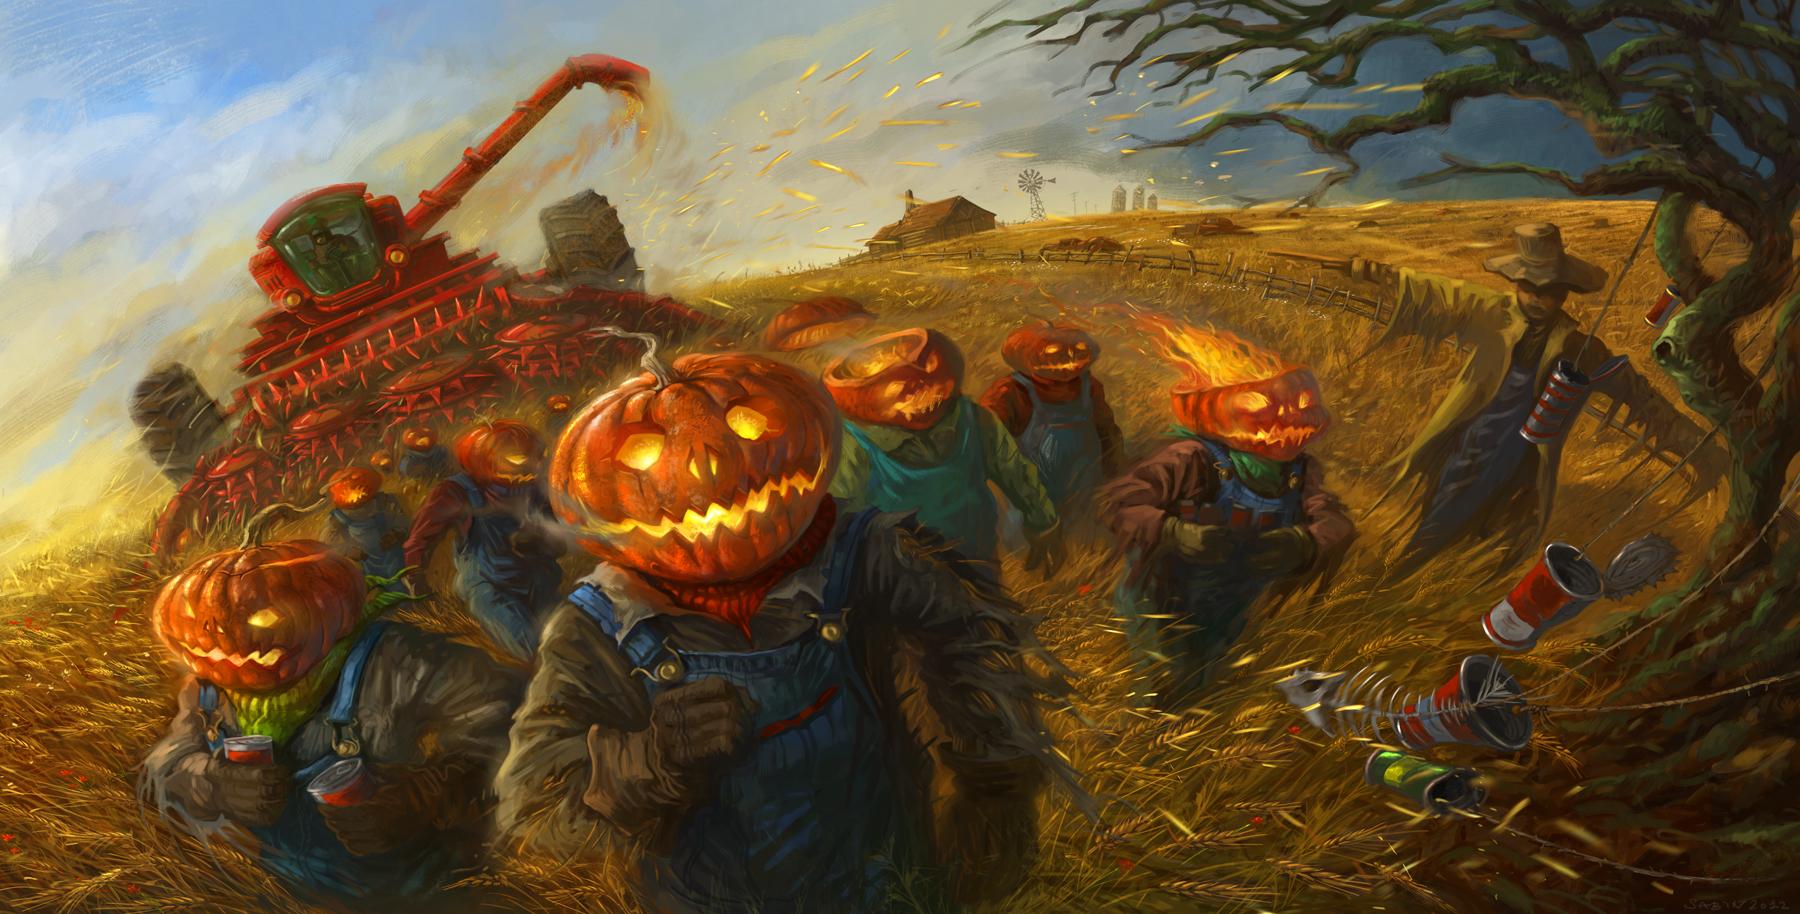 1329-harvest-time-sabin-boykinov